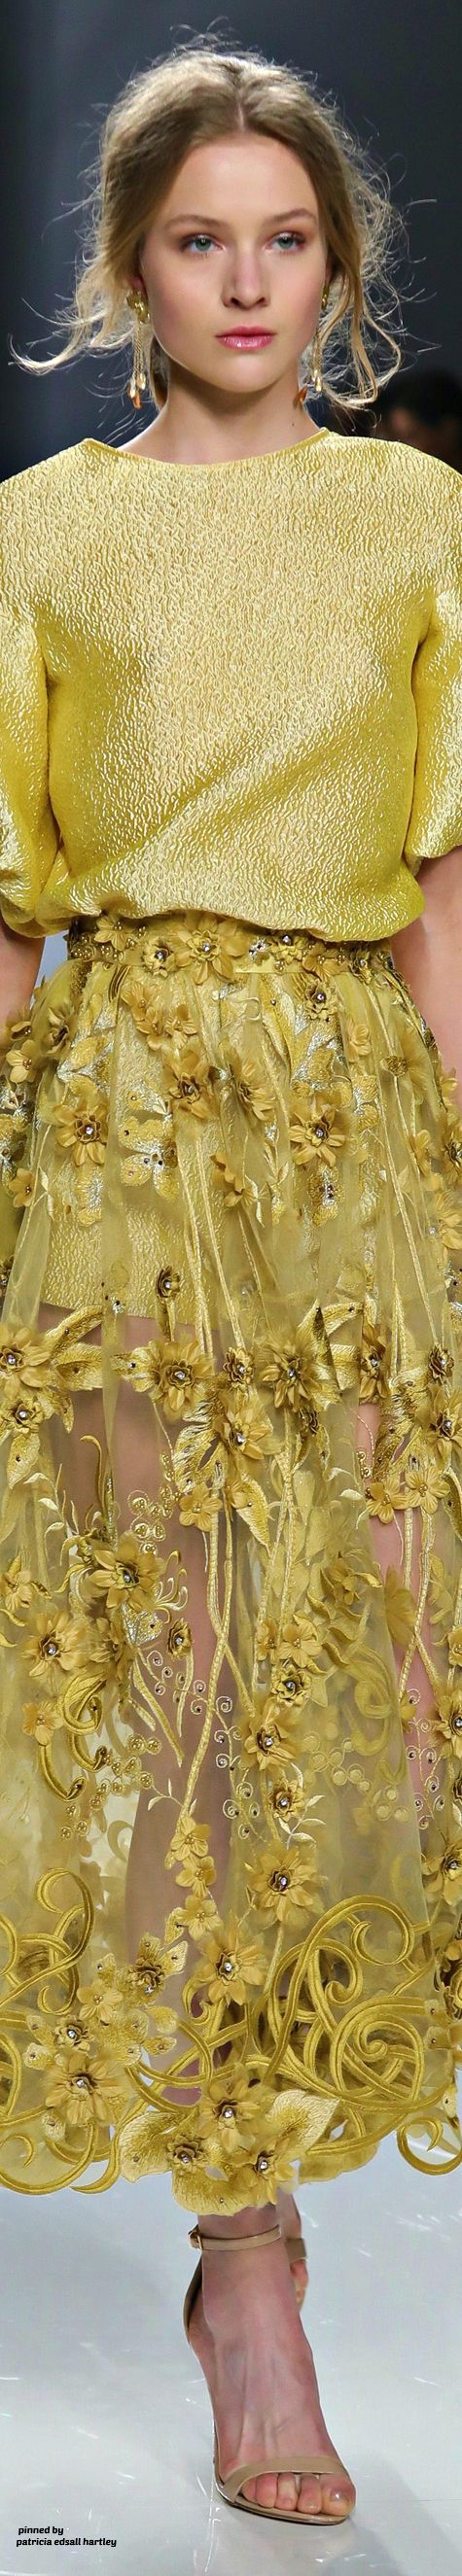 Carla Ruiz Spring 2018 yellow over yellow lace